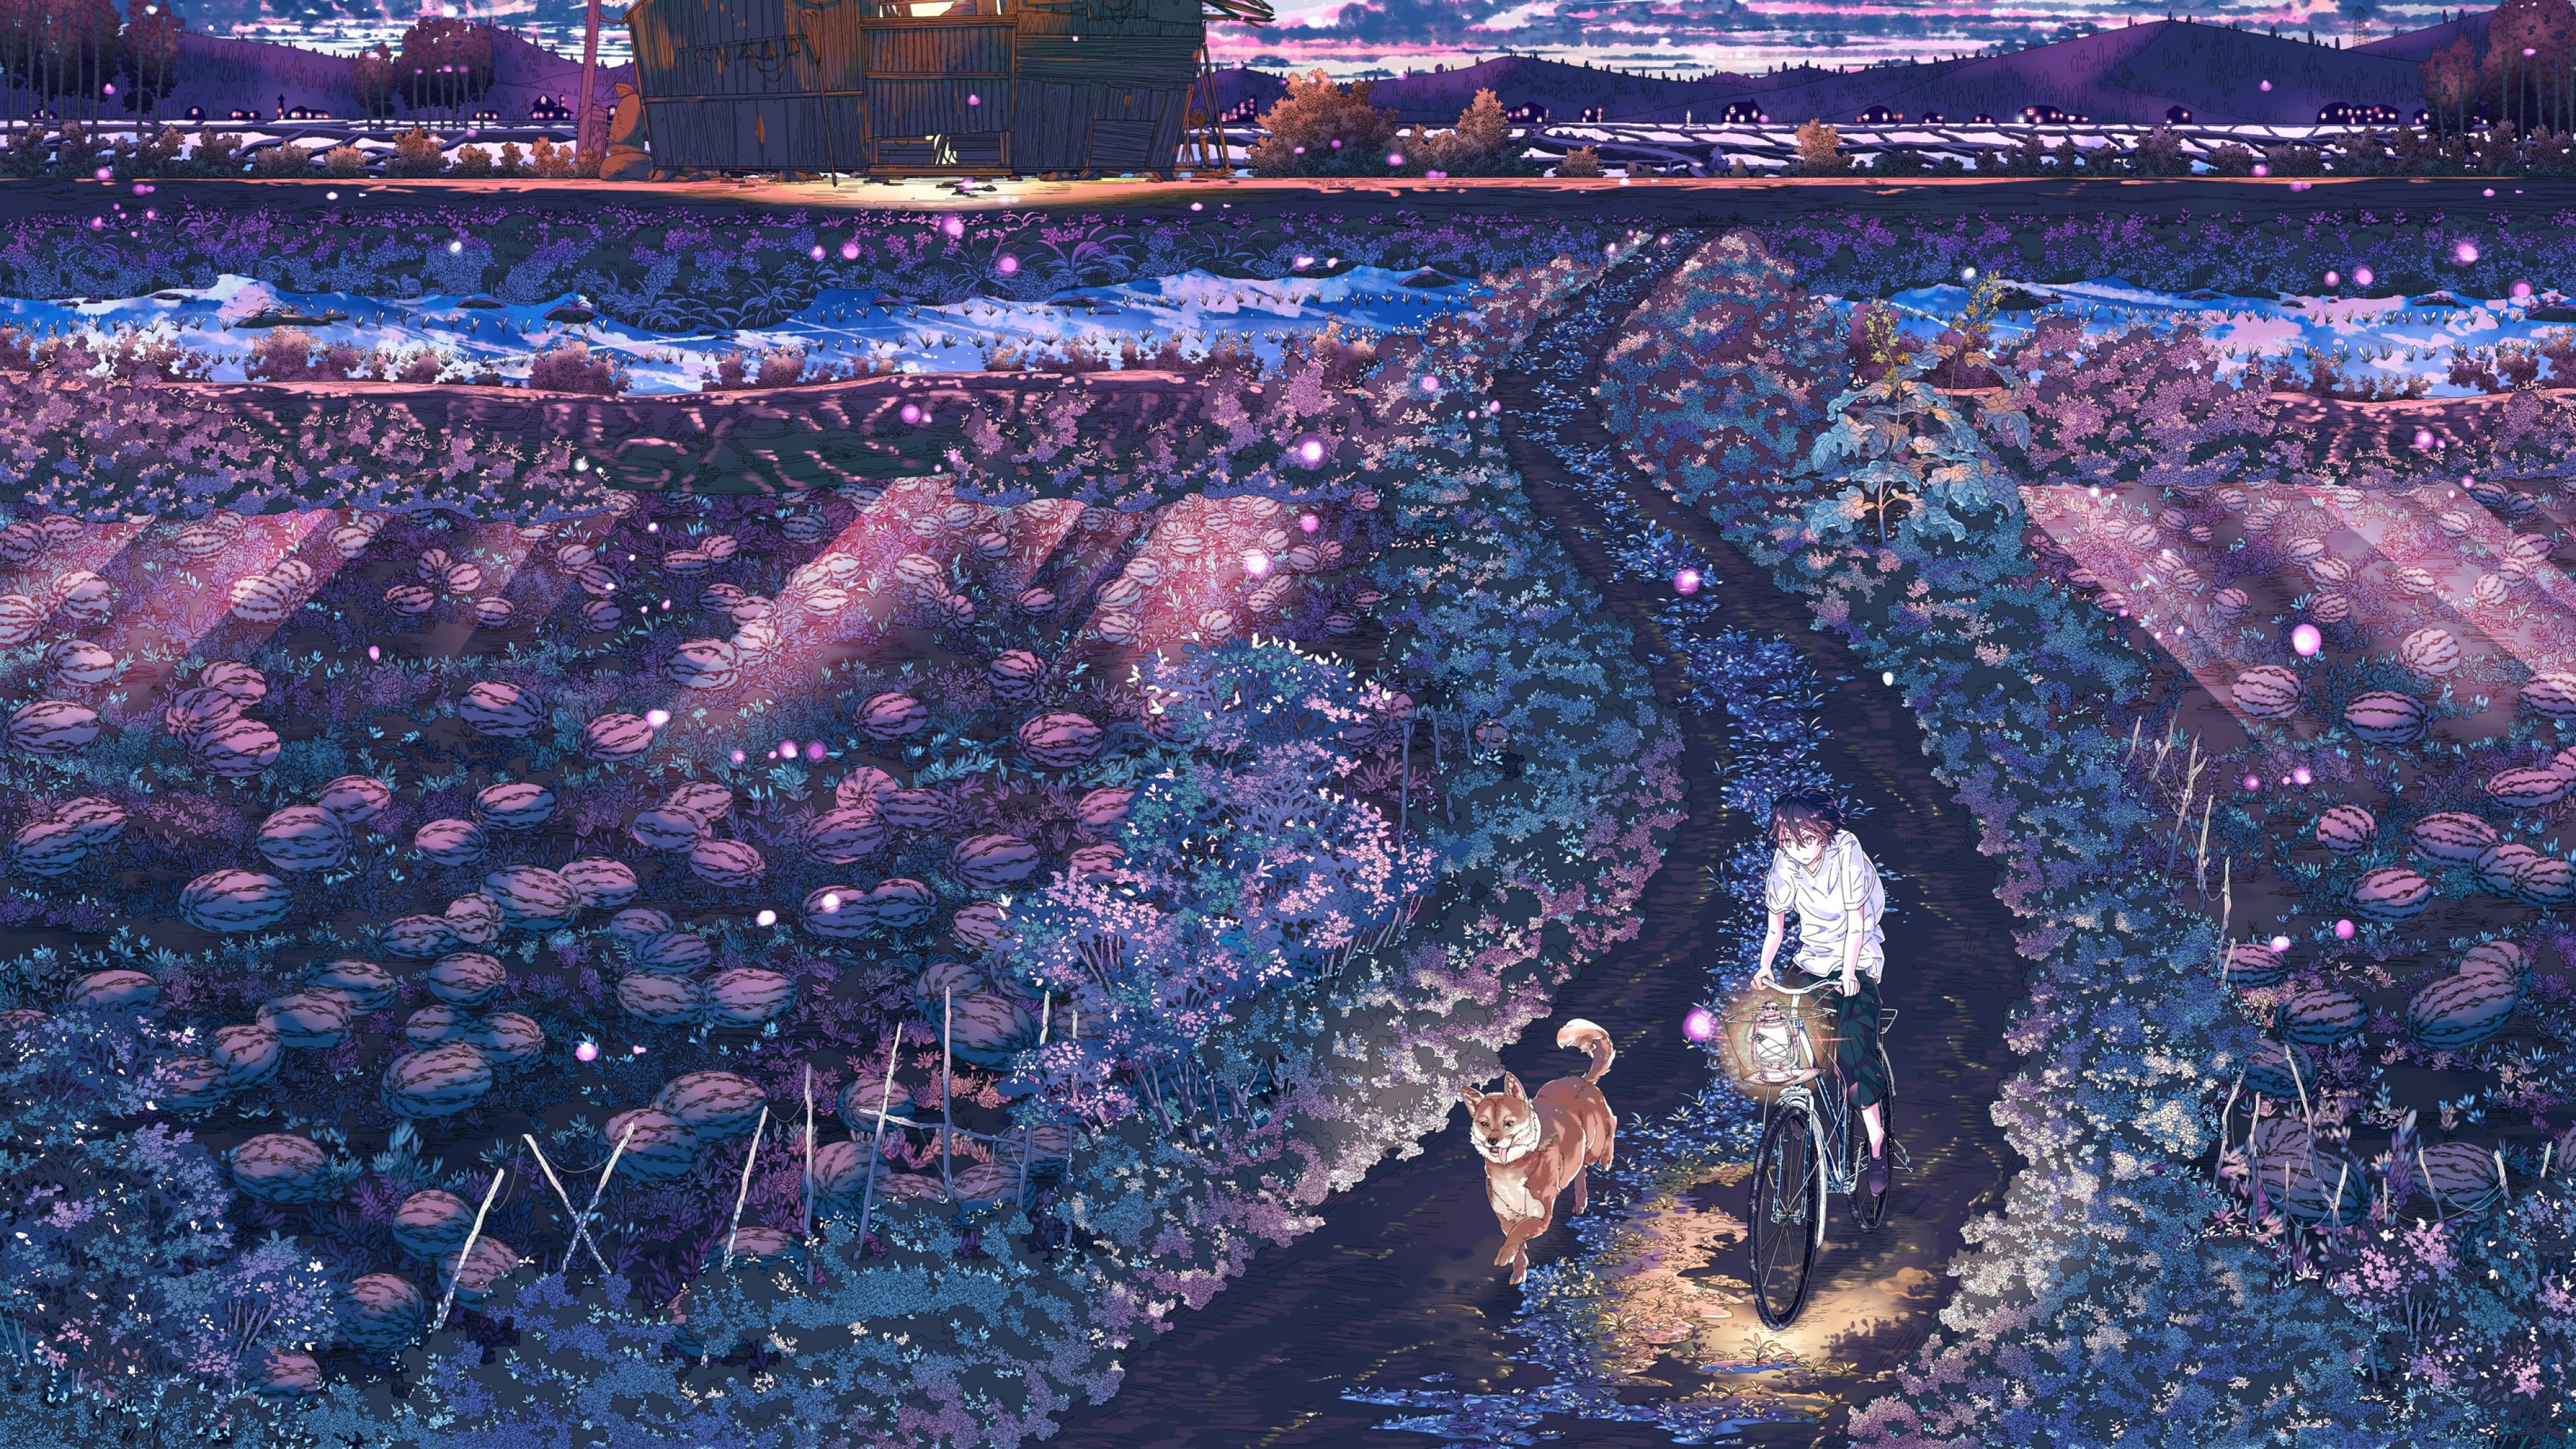 field night anime 1541973543 - Field Night Anime - night wallpapers, lights wallpapers, field wallpapers, anime wallpapers